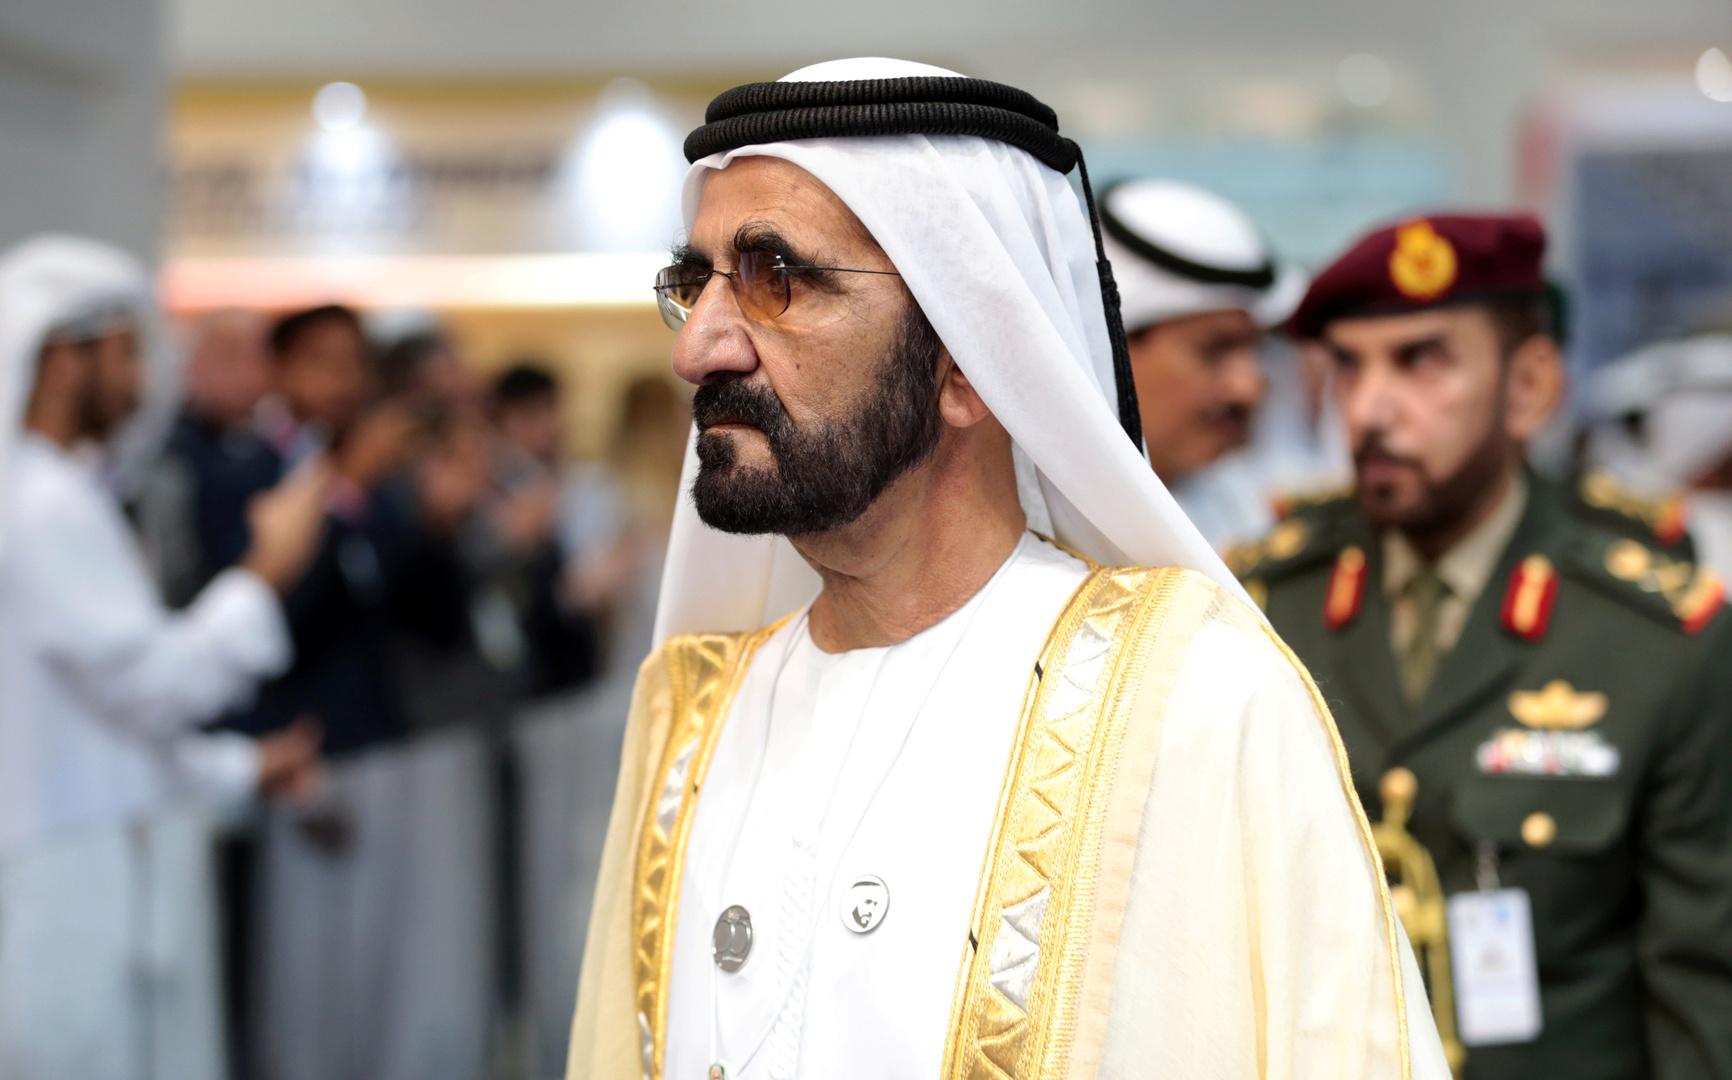 محمد بن راشد، حاكم دبي